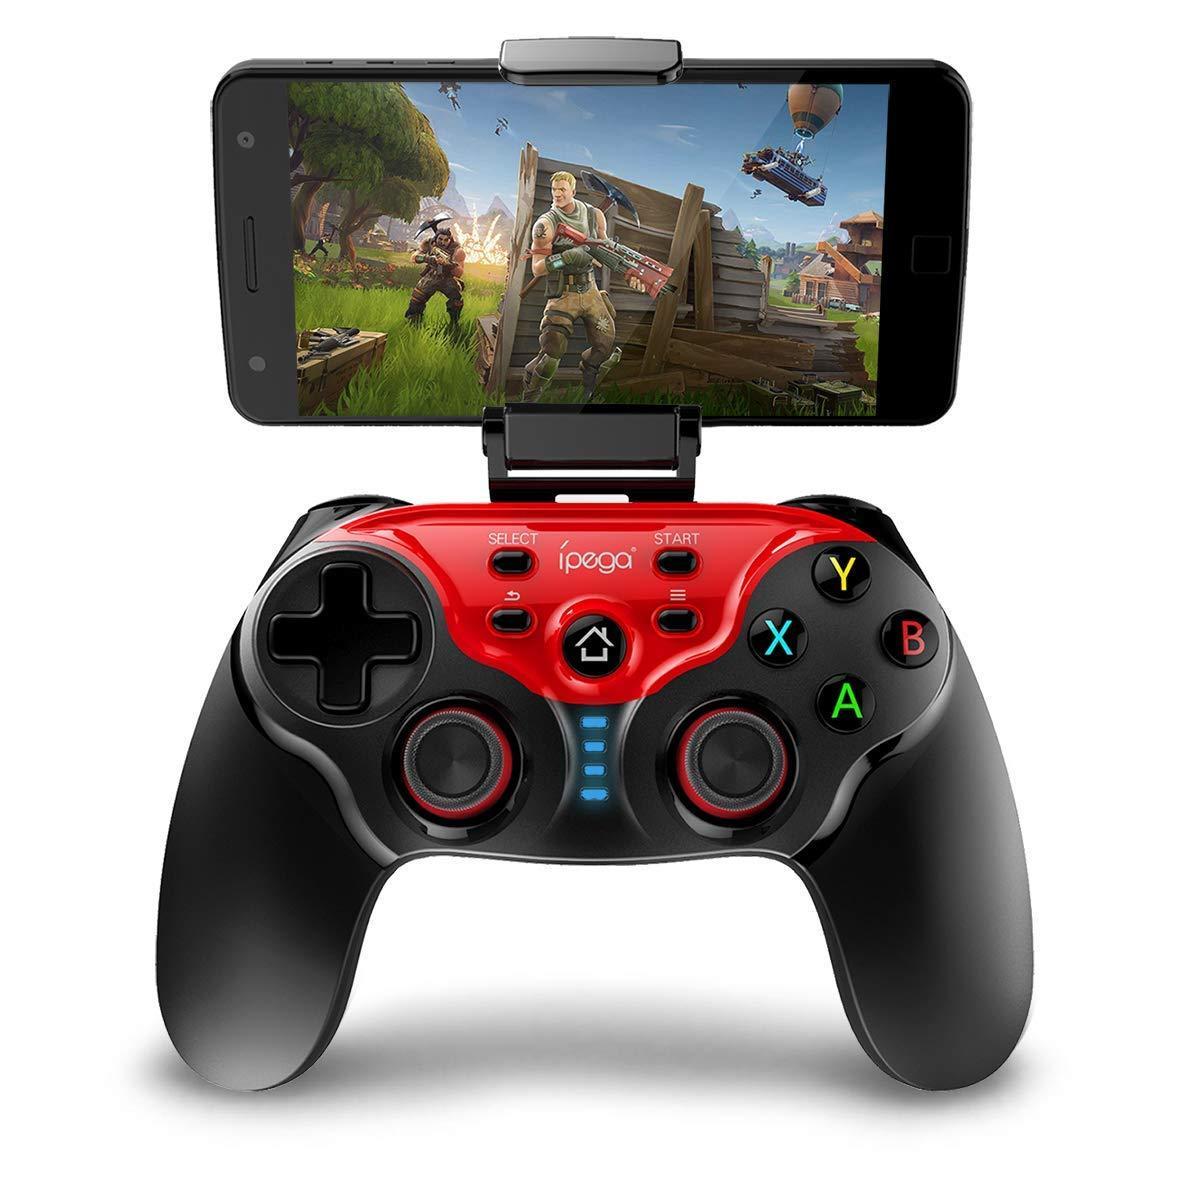 IPEGA 9088 - Mobile Bluetooth Gaming Joystick Handle Controller Gamepad For Playing PUBG Game IOS/